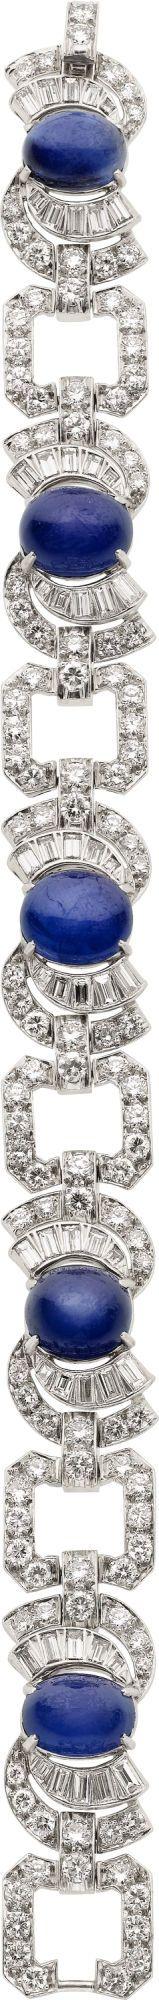 Art Deco Star Sapphire, Diamond, Platinum Bracelet. .